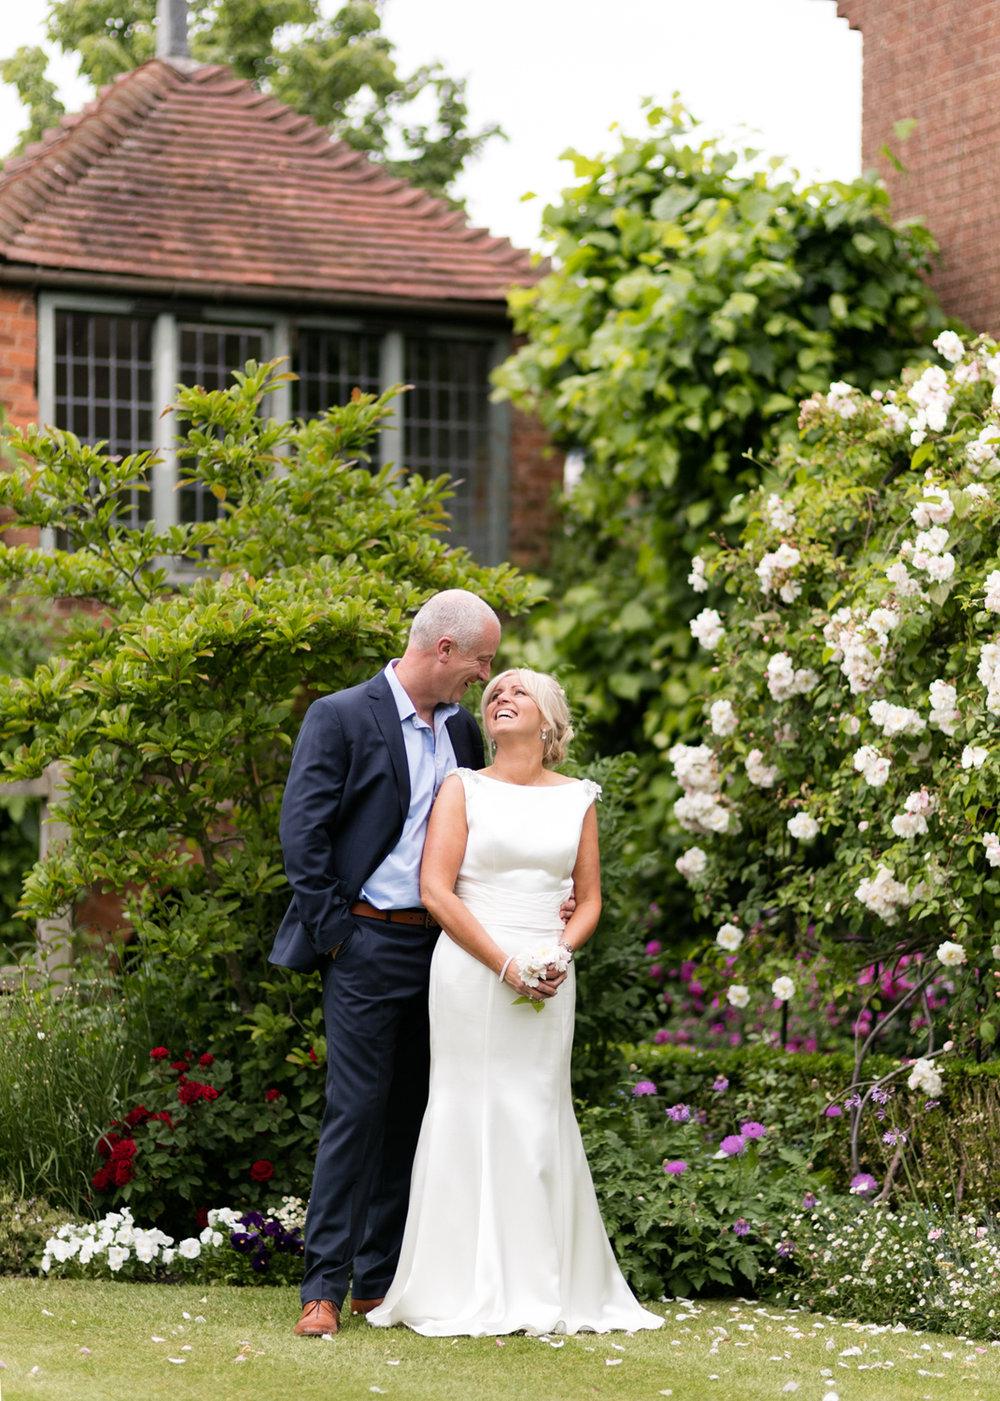 Wedding-Photography-Lord-Leycester-Hospital19.jpg